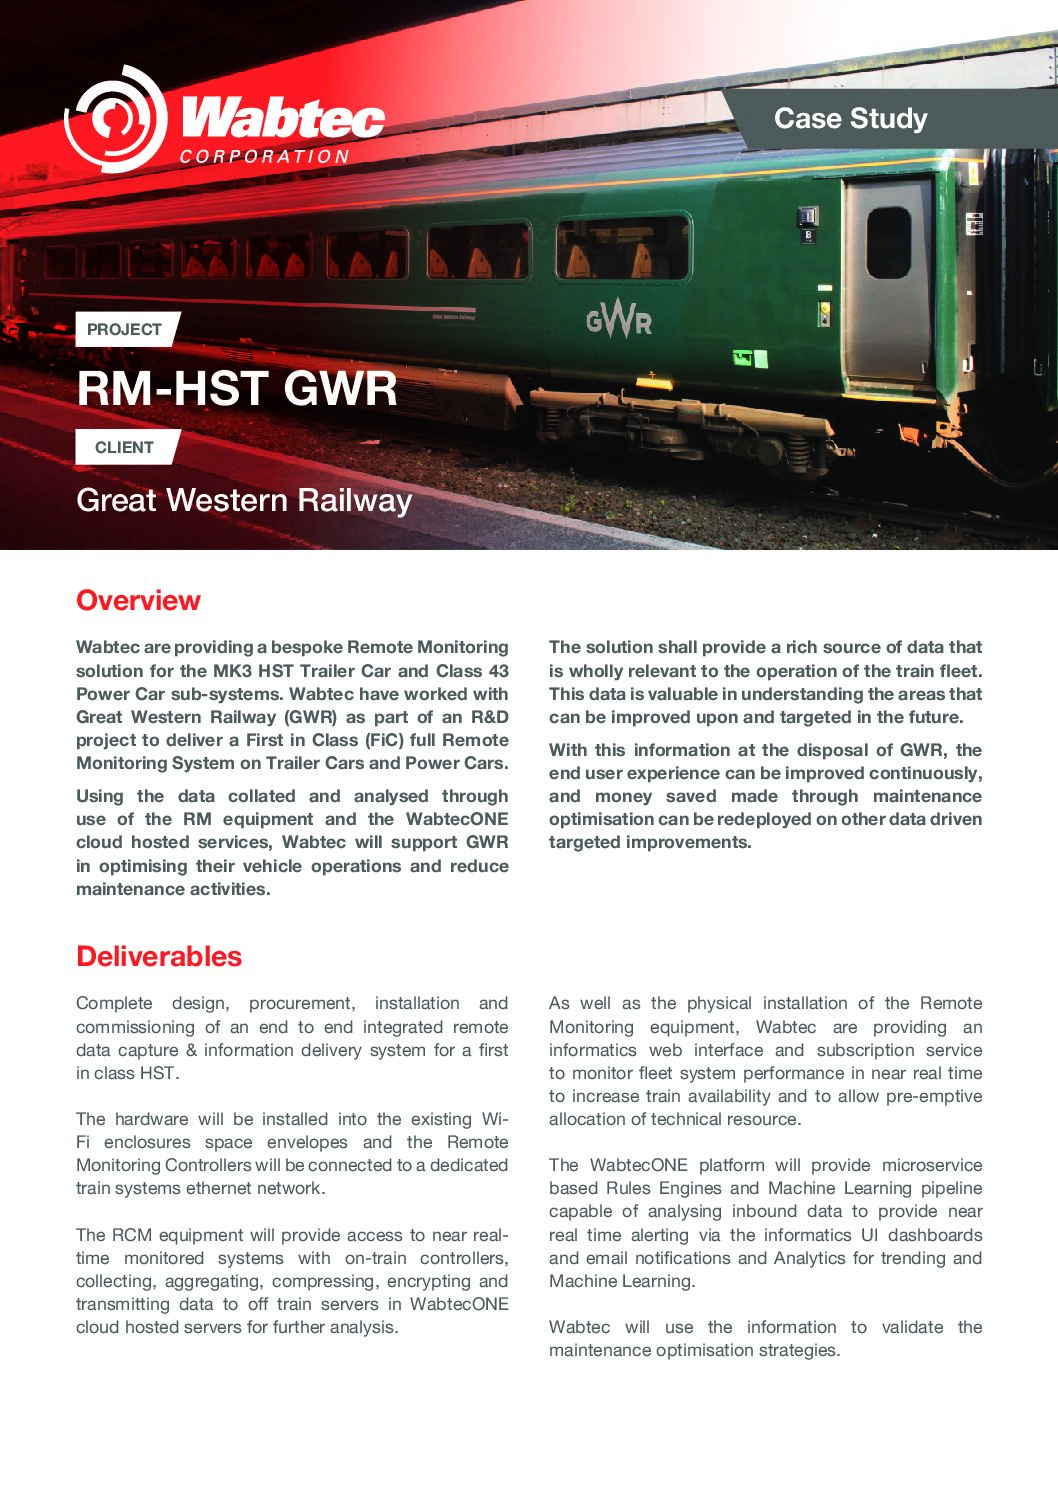 Wabtec RM-HST GWR Case Study